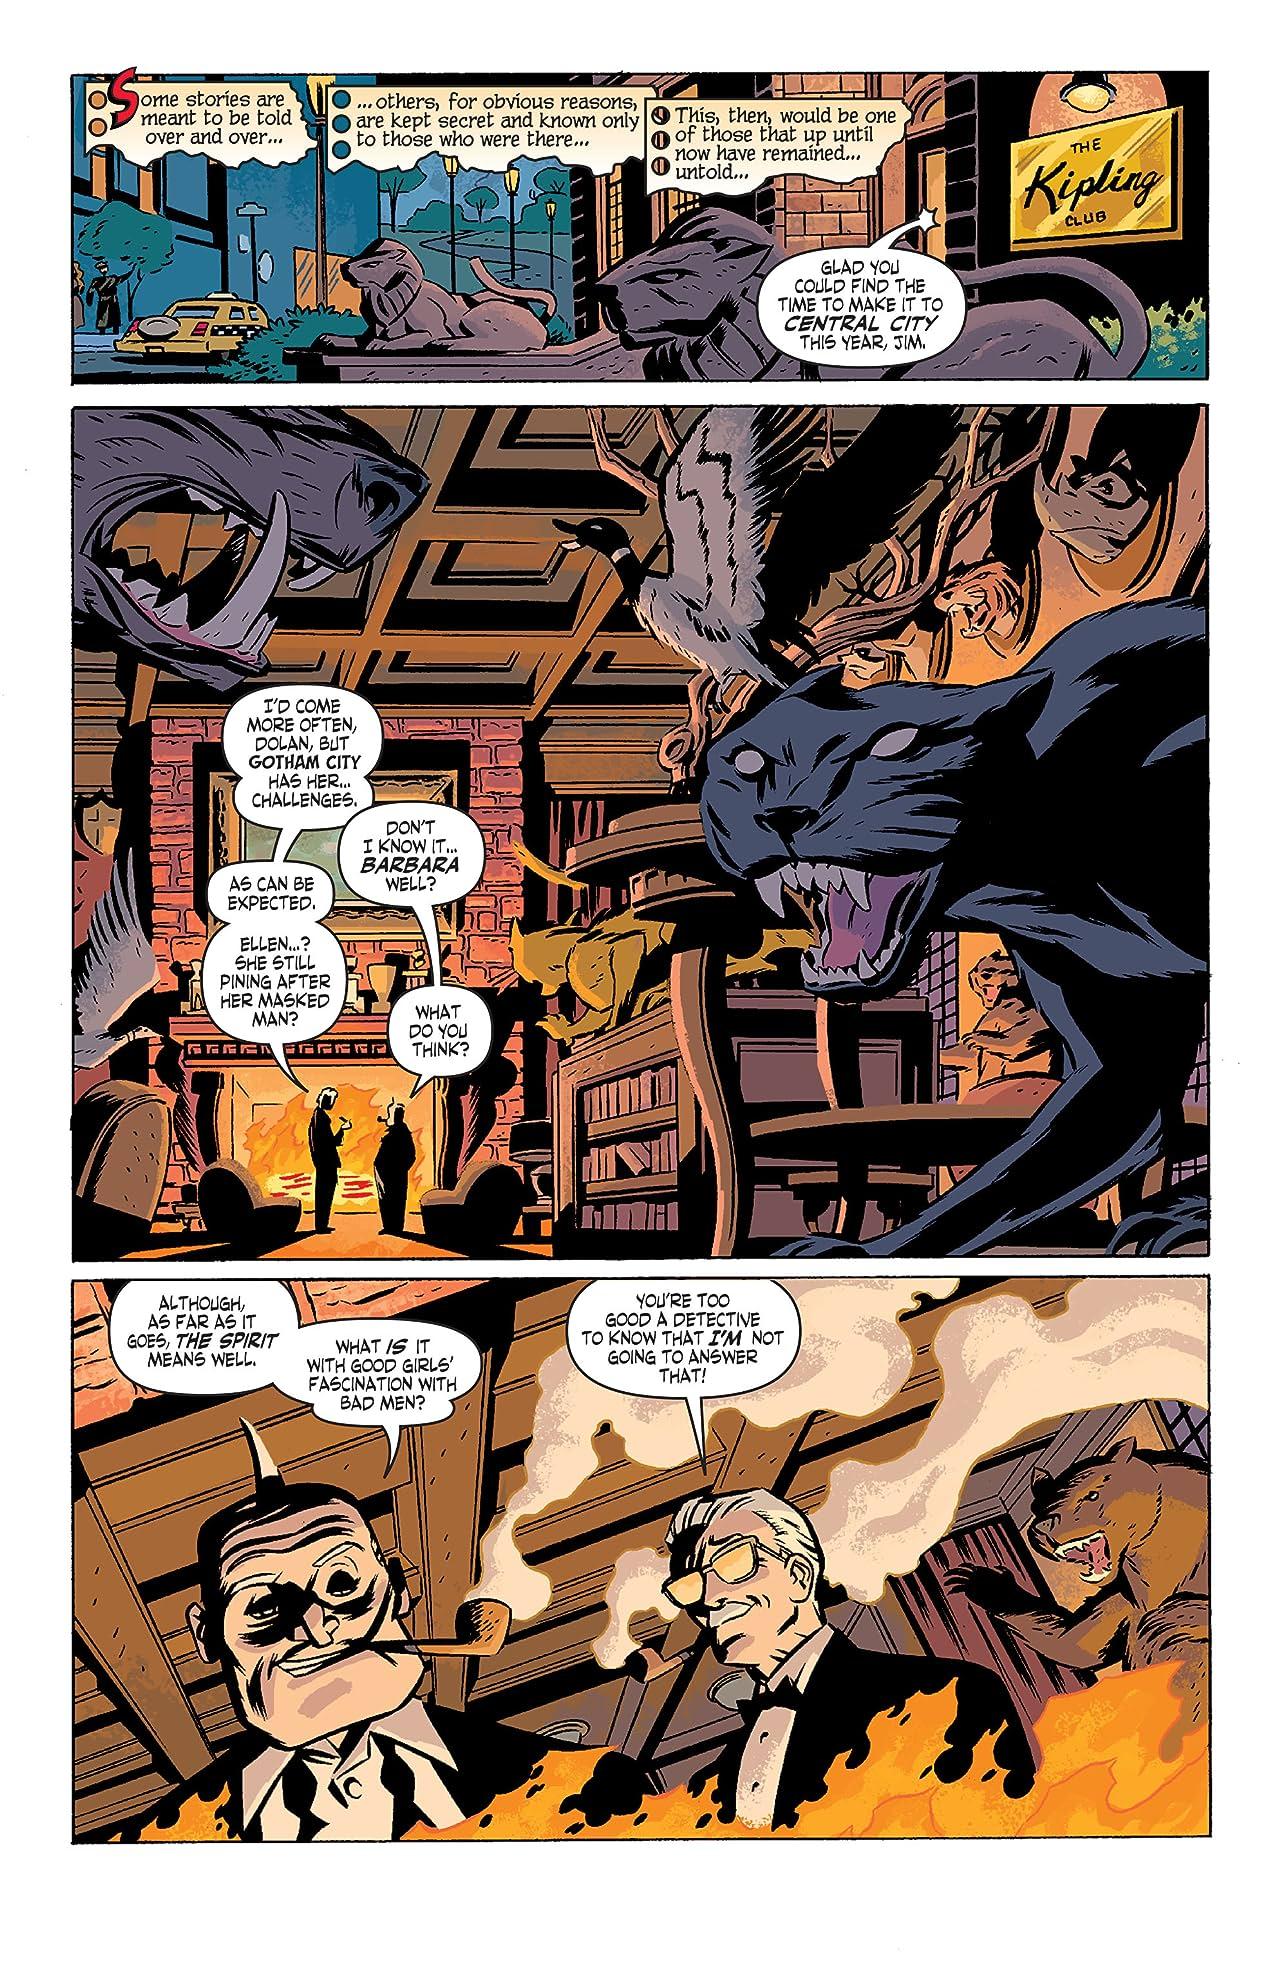 Batman/The Spirit (2007) #1